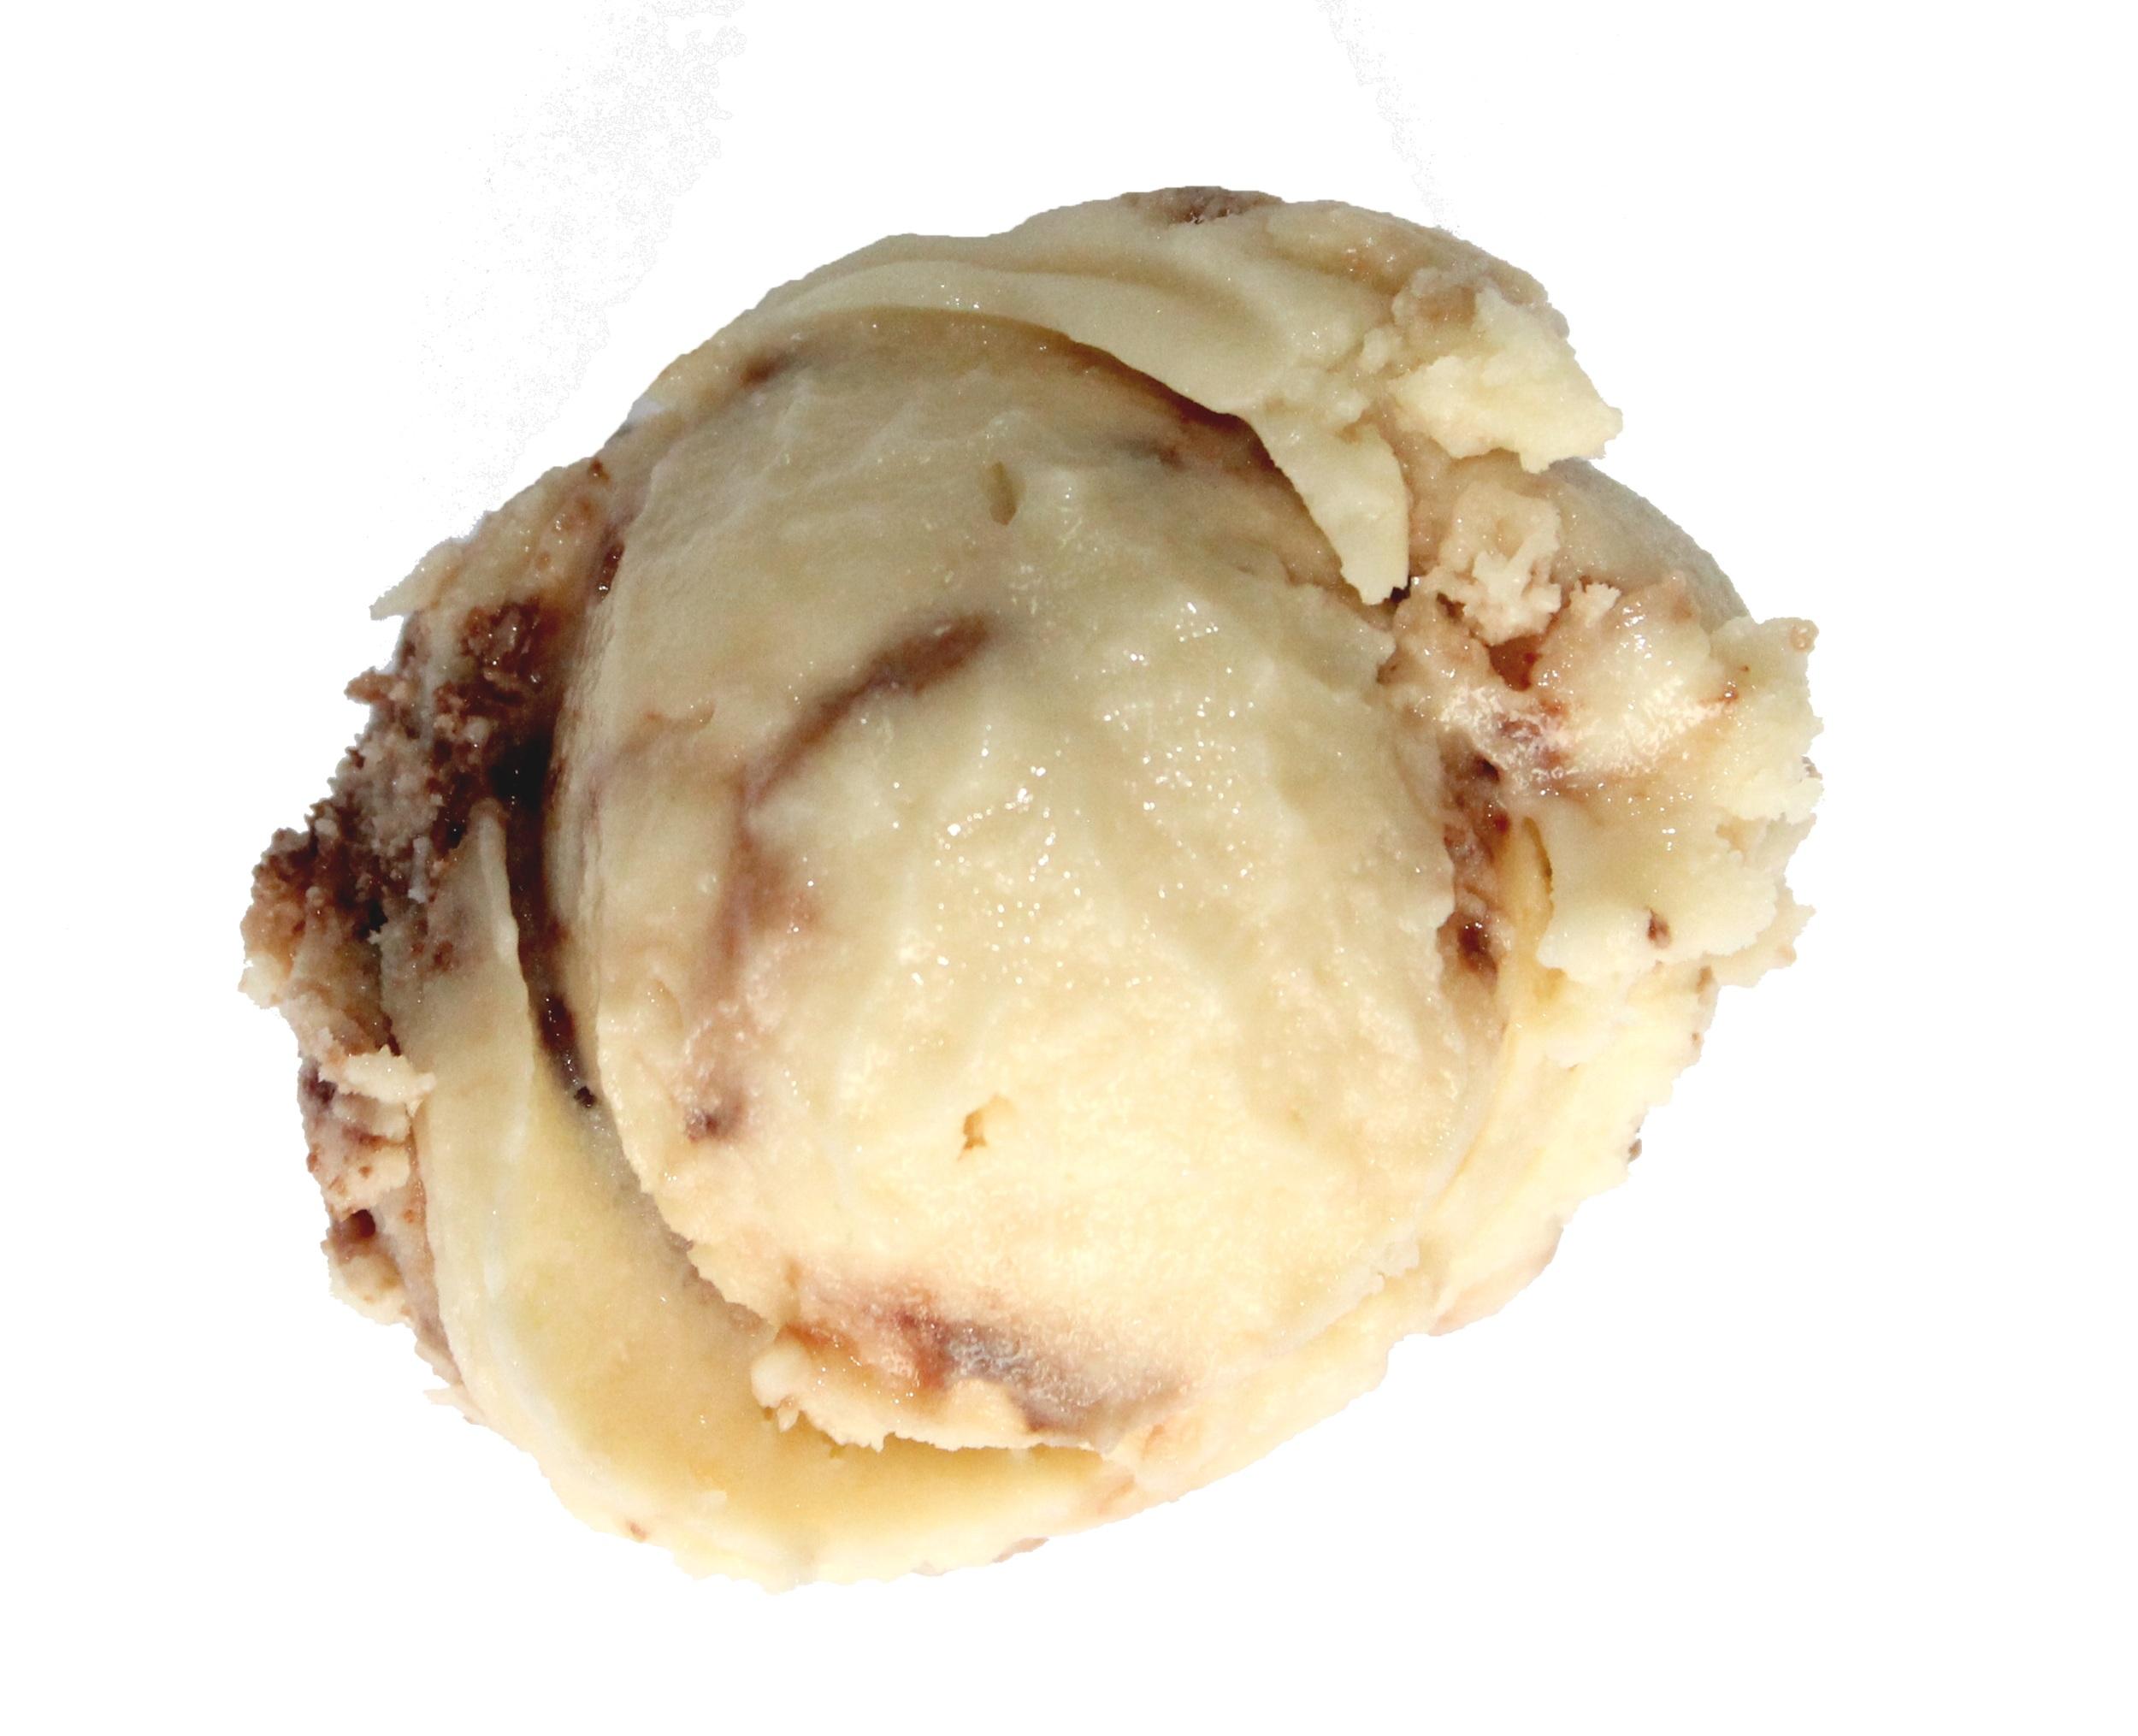 Coconut Caramel & Salted Ganache